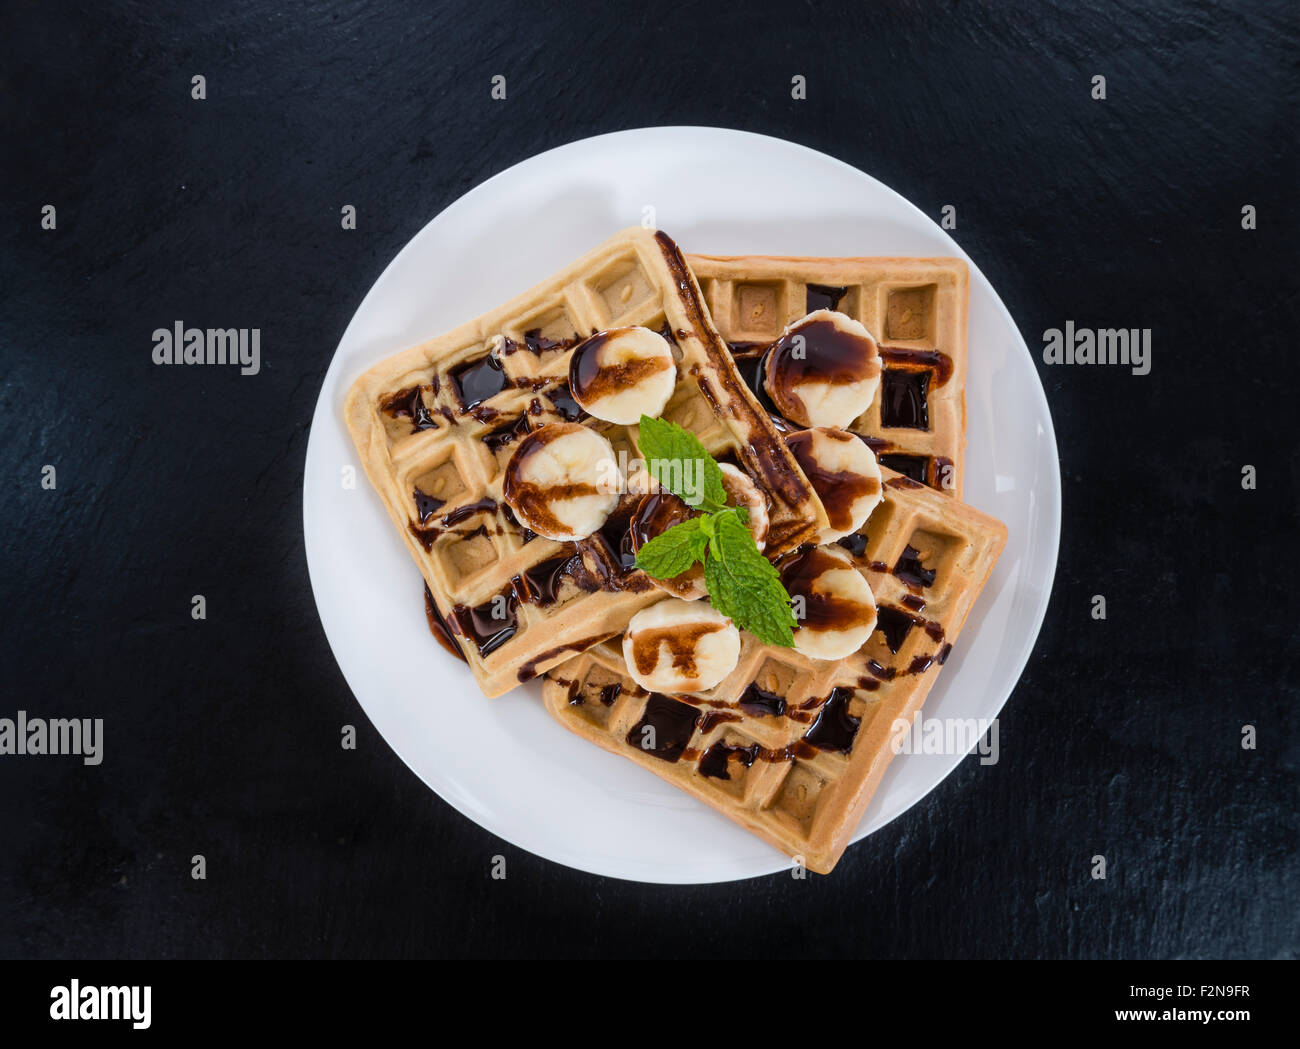 Waffles with Bananas and Chocolate Sauce (close-up shot) - Stock Image